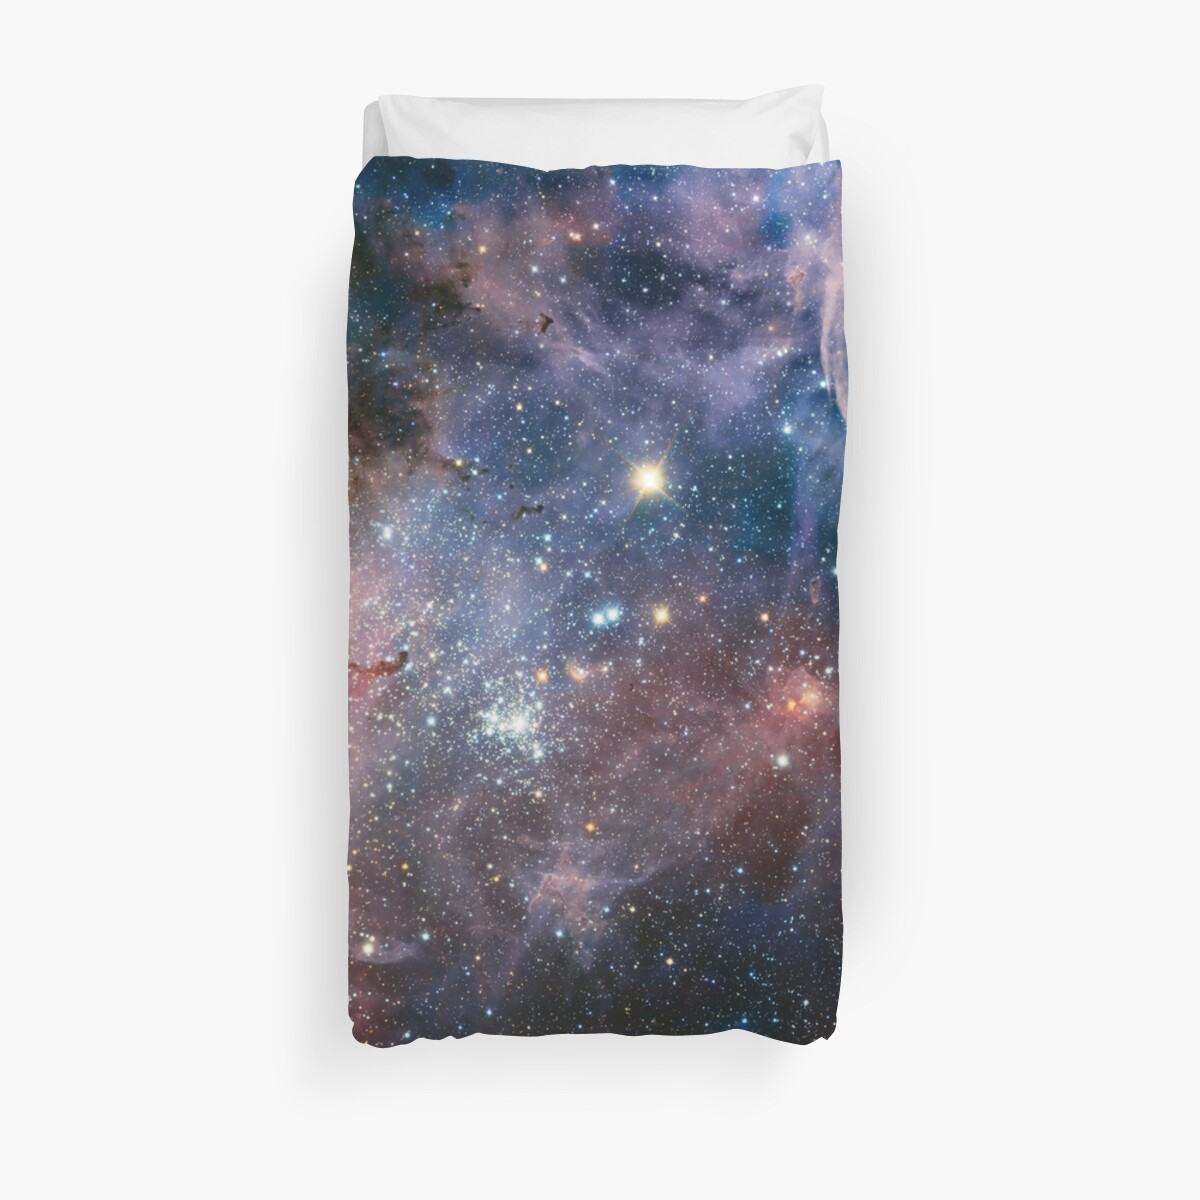 Galaxie - Nebel 01 von GALAXYGRAFIKA